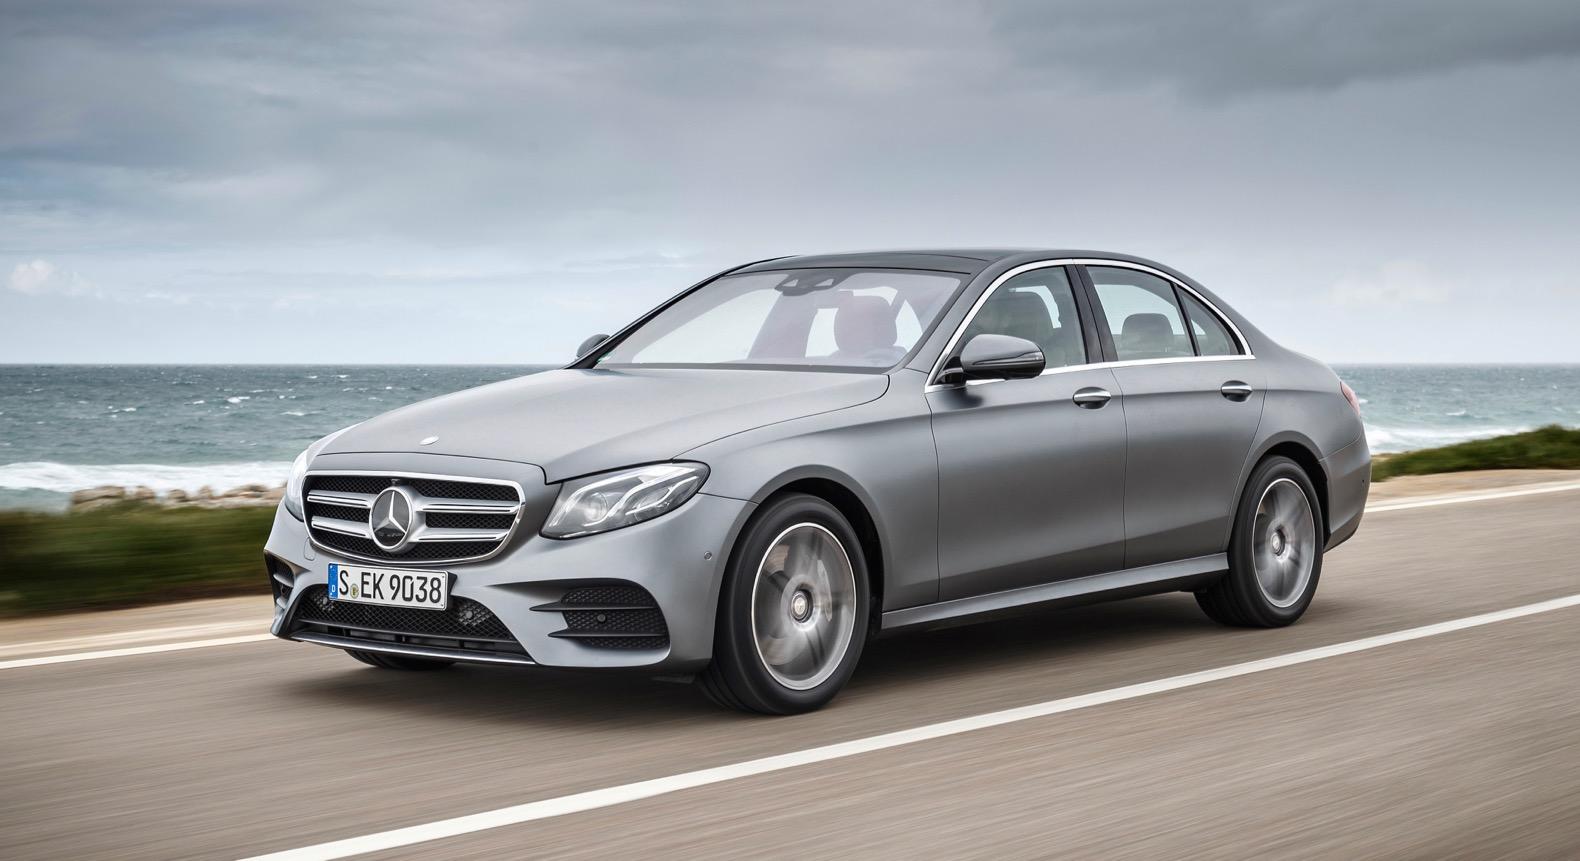 Prueba De Manejo Mercedes Benz Sedan Clase E Puros Autos